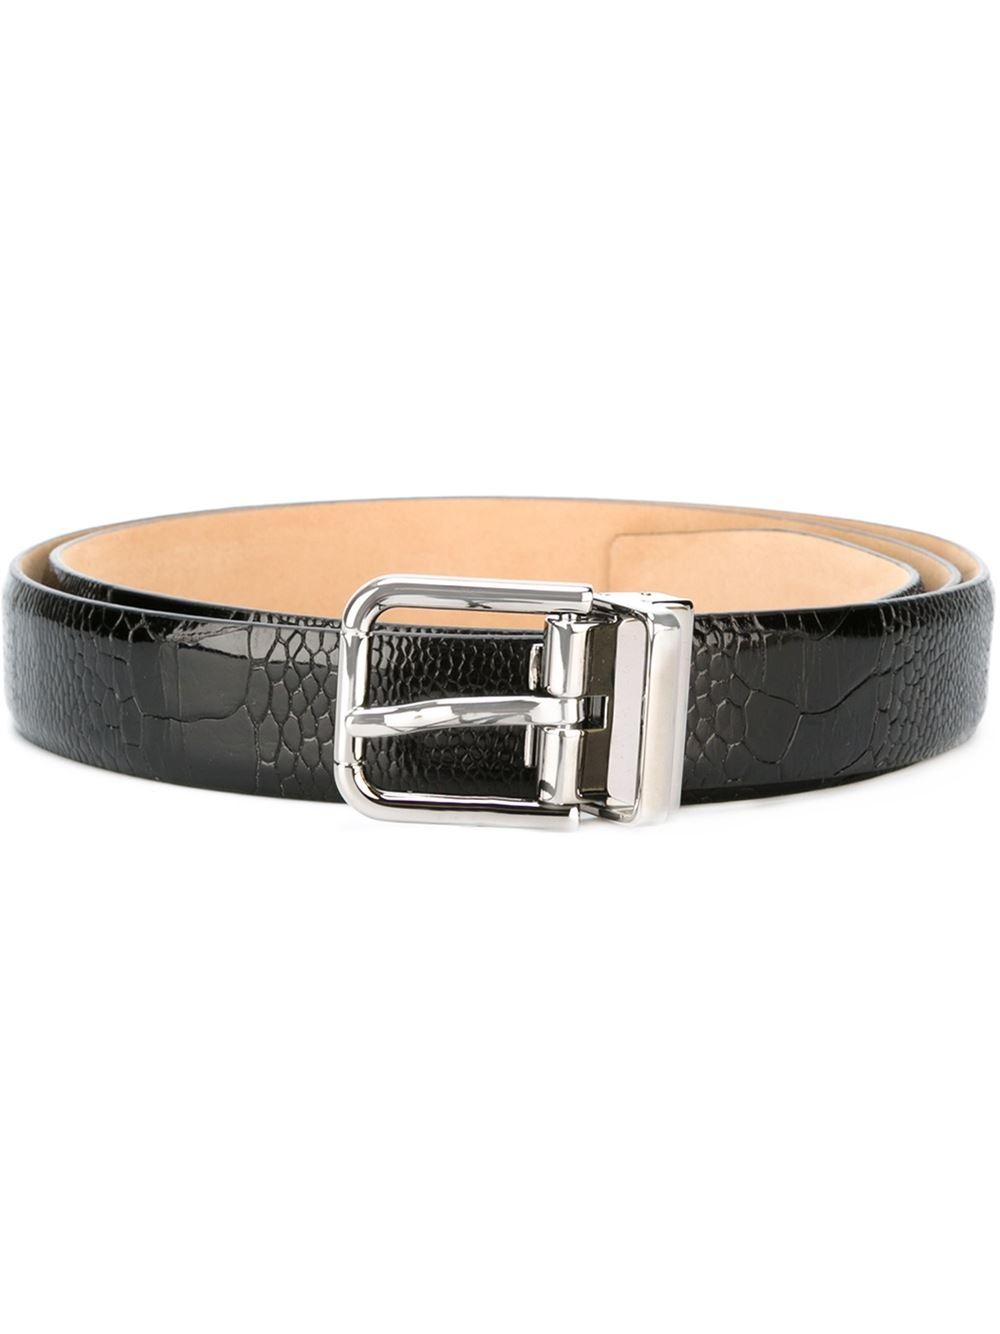 7bbbe22461 ... sale lyst dolce gabbana ostrich leather belt in black for men 3cf79  c2e72